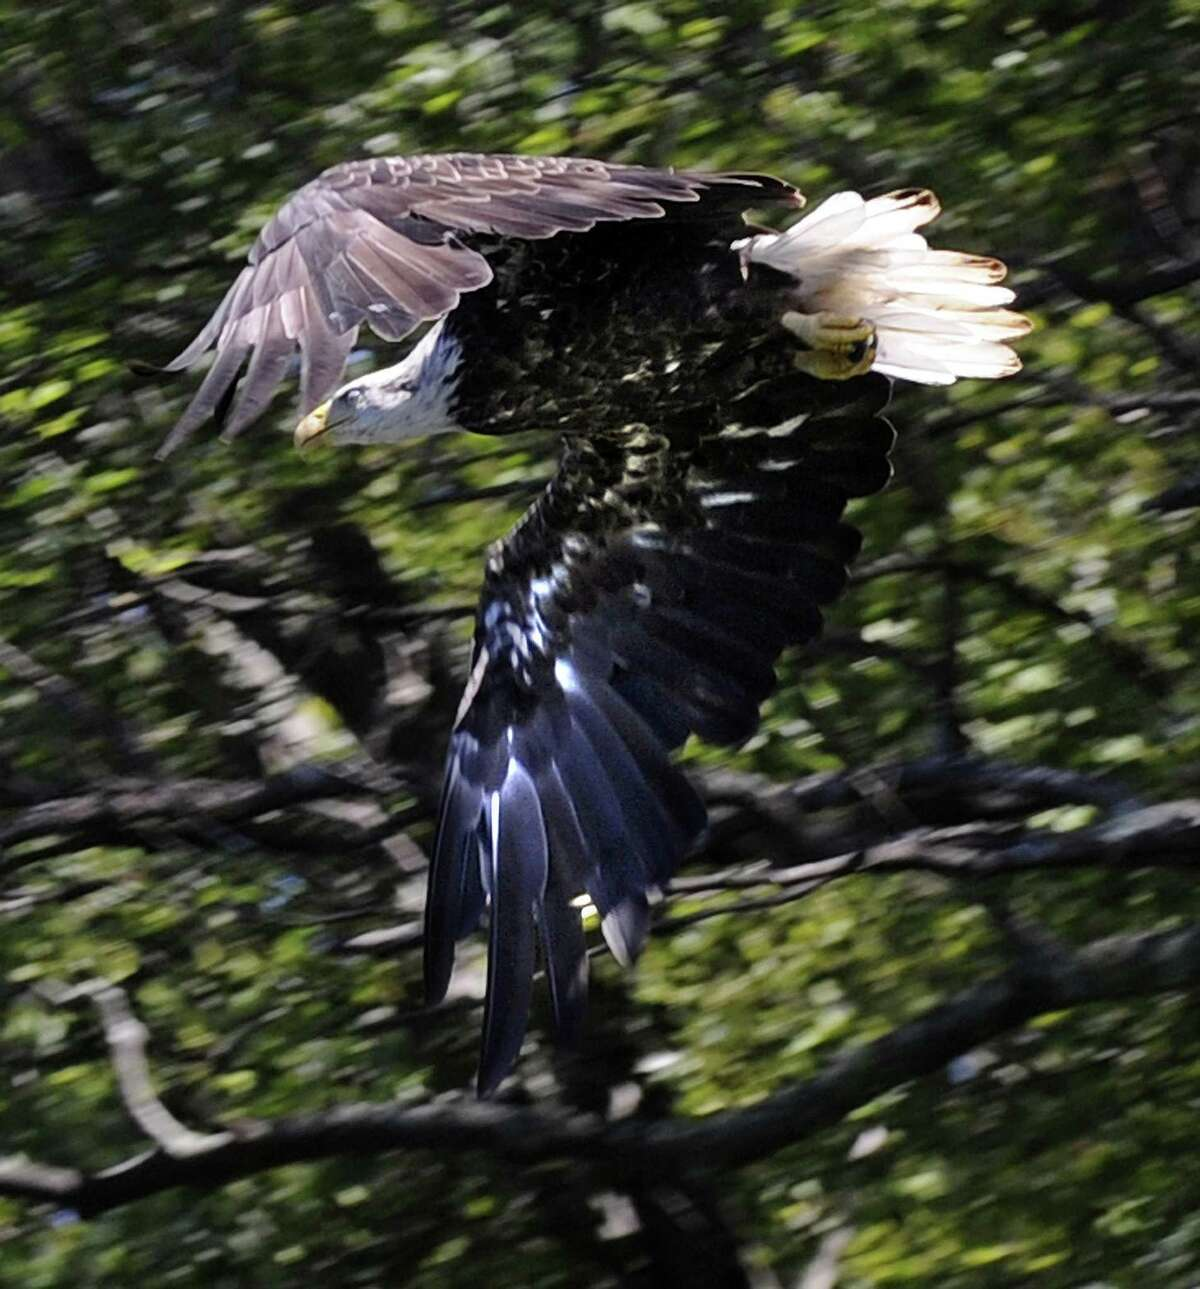 A bald eagle flies over Candlewood Lake Thursday, July 19, 2018.